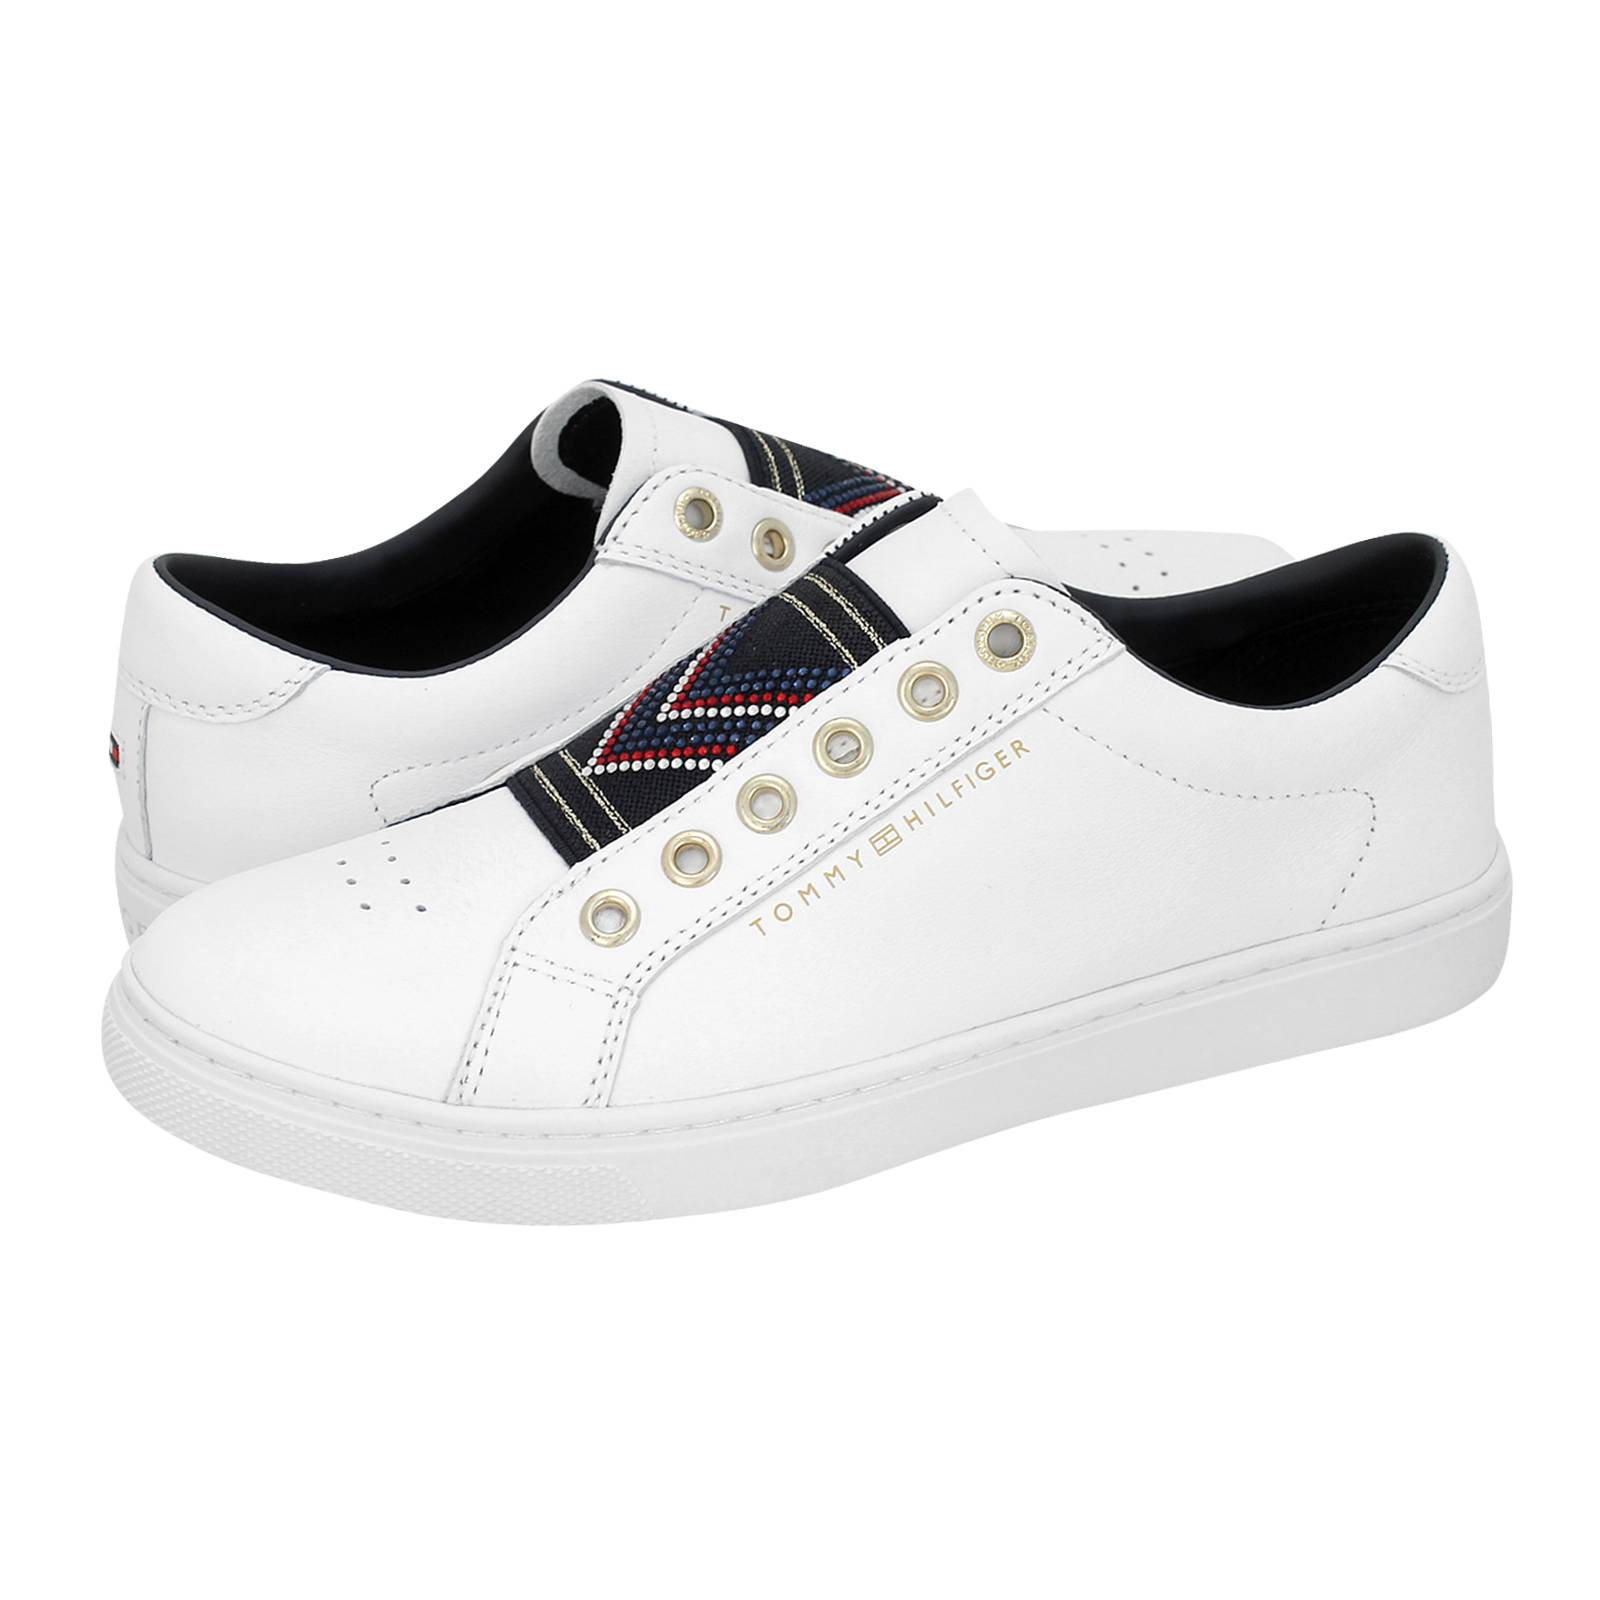 Stud Elastic Essential Sneaker - Γυναικεία παπούτσια casual Tommy ... bb5c0d39d02